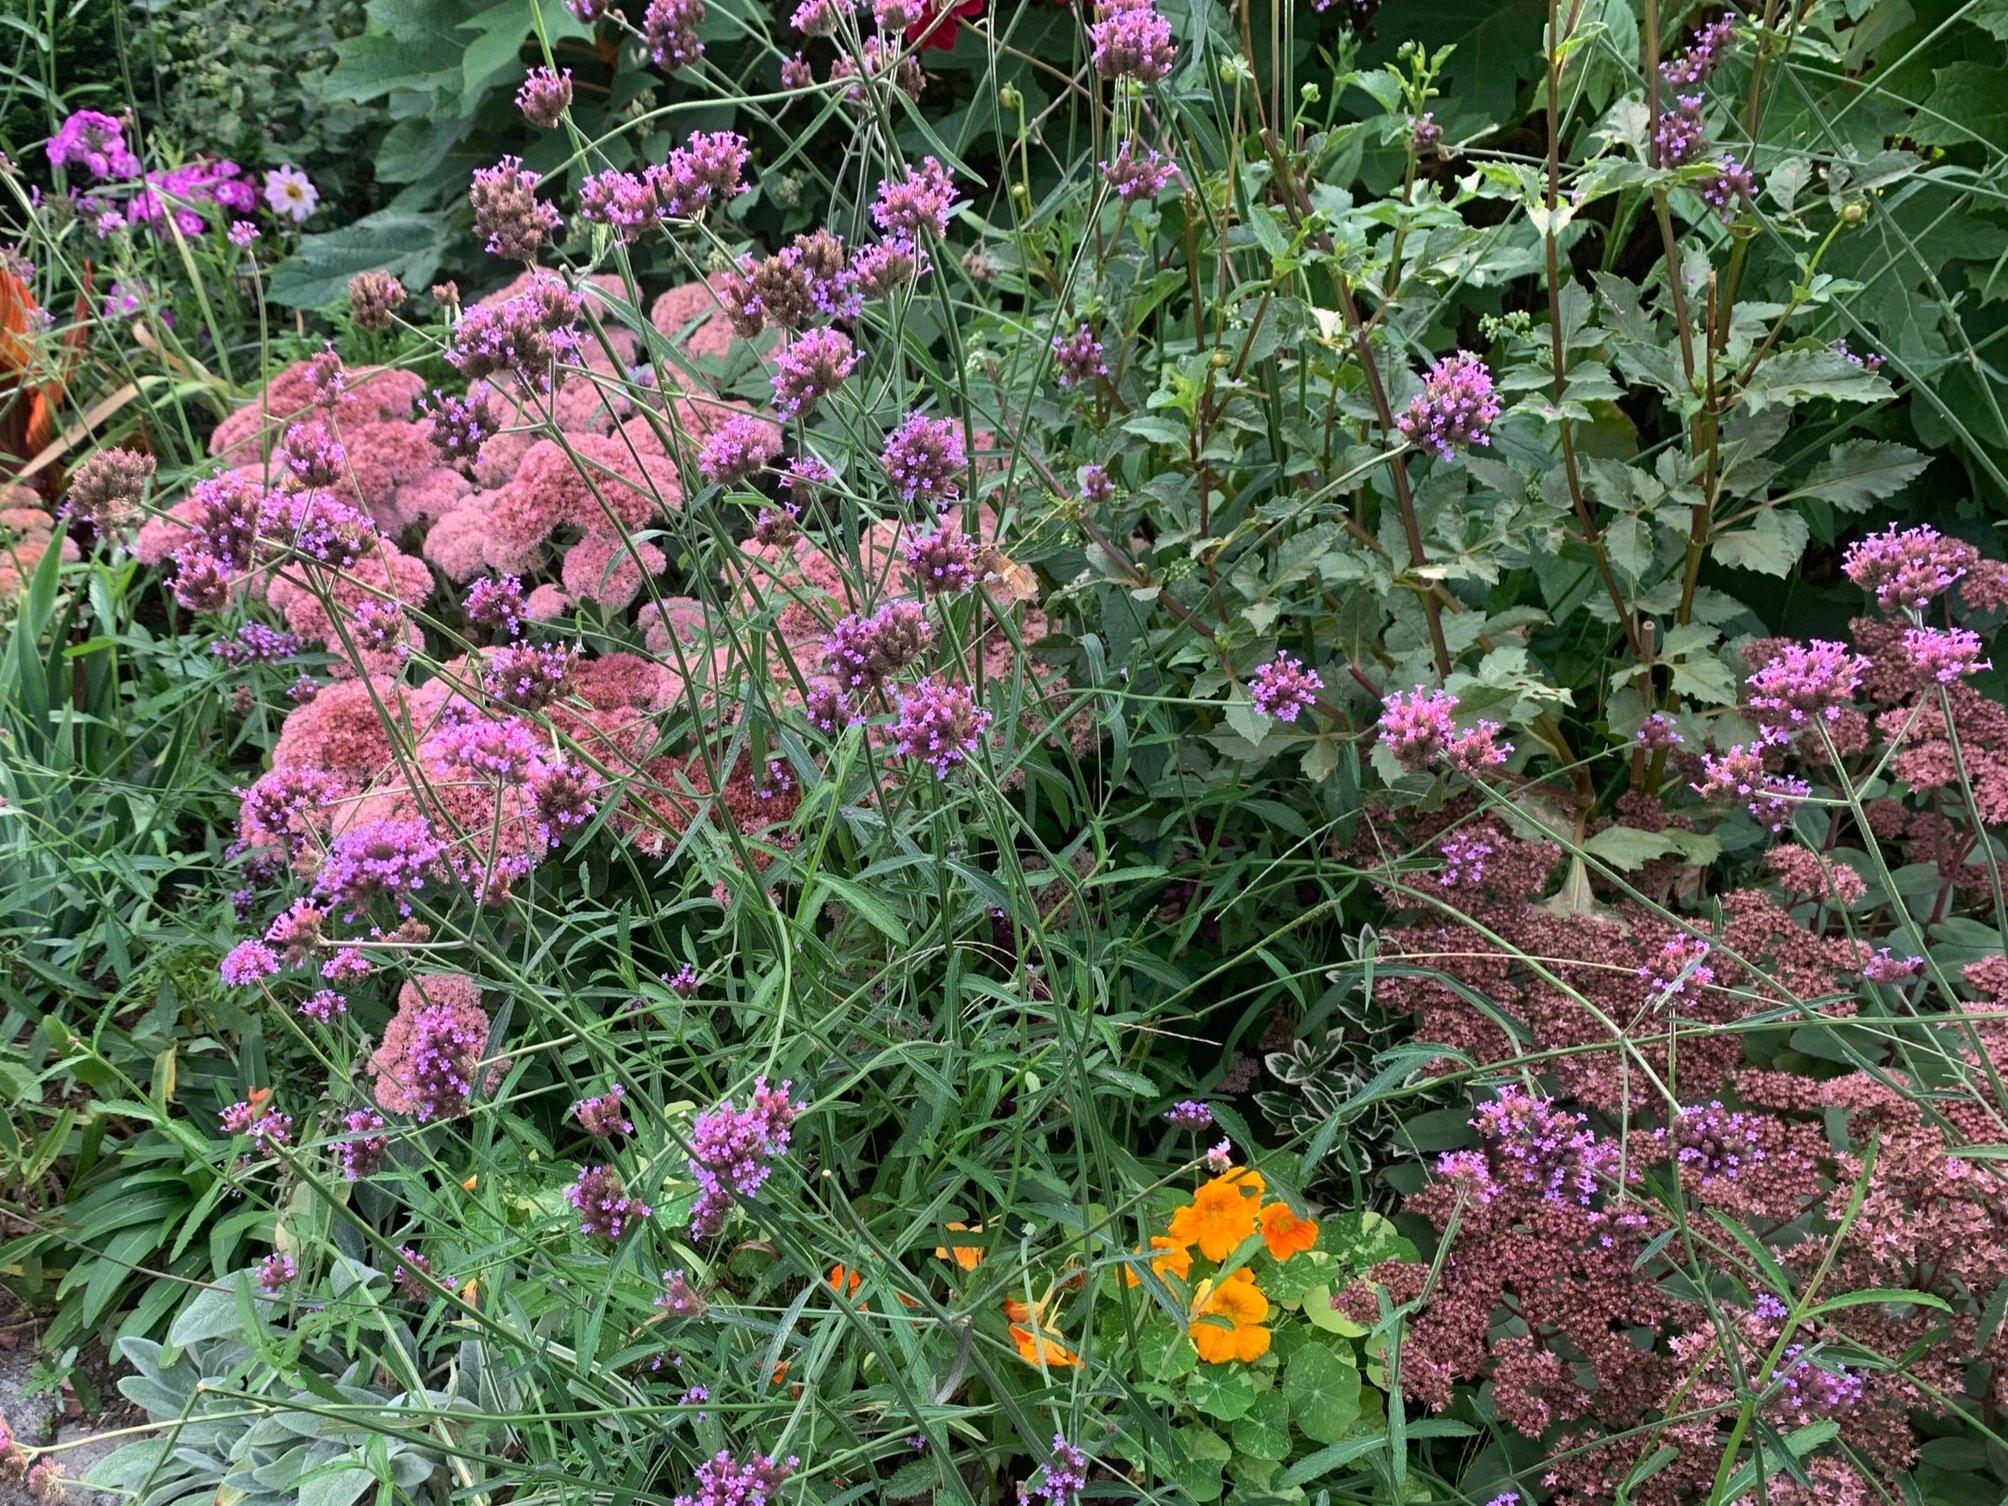 Smorgasbord of Verbena b., Nasturtium 'Alaska', Sedum 'Autumn Joy', Sedum 'matrona', and Dahlia 'Bishop of Dover'